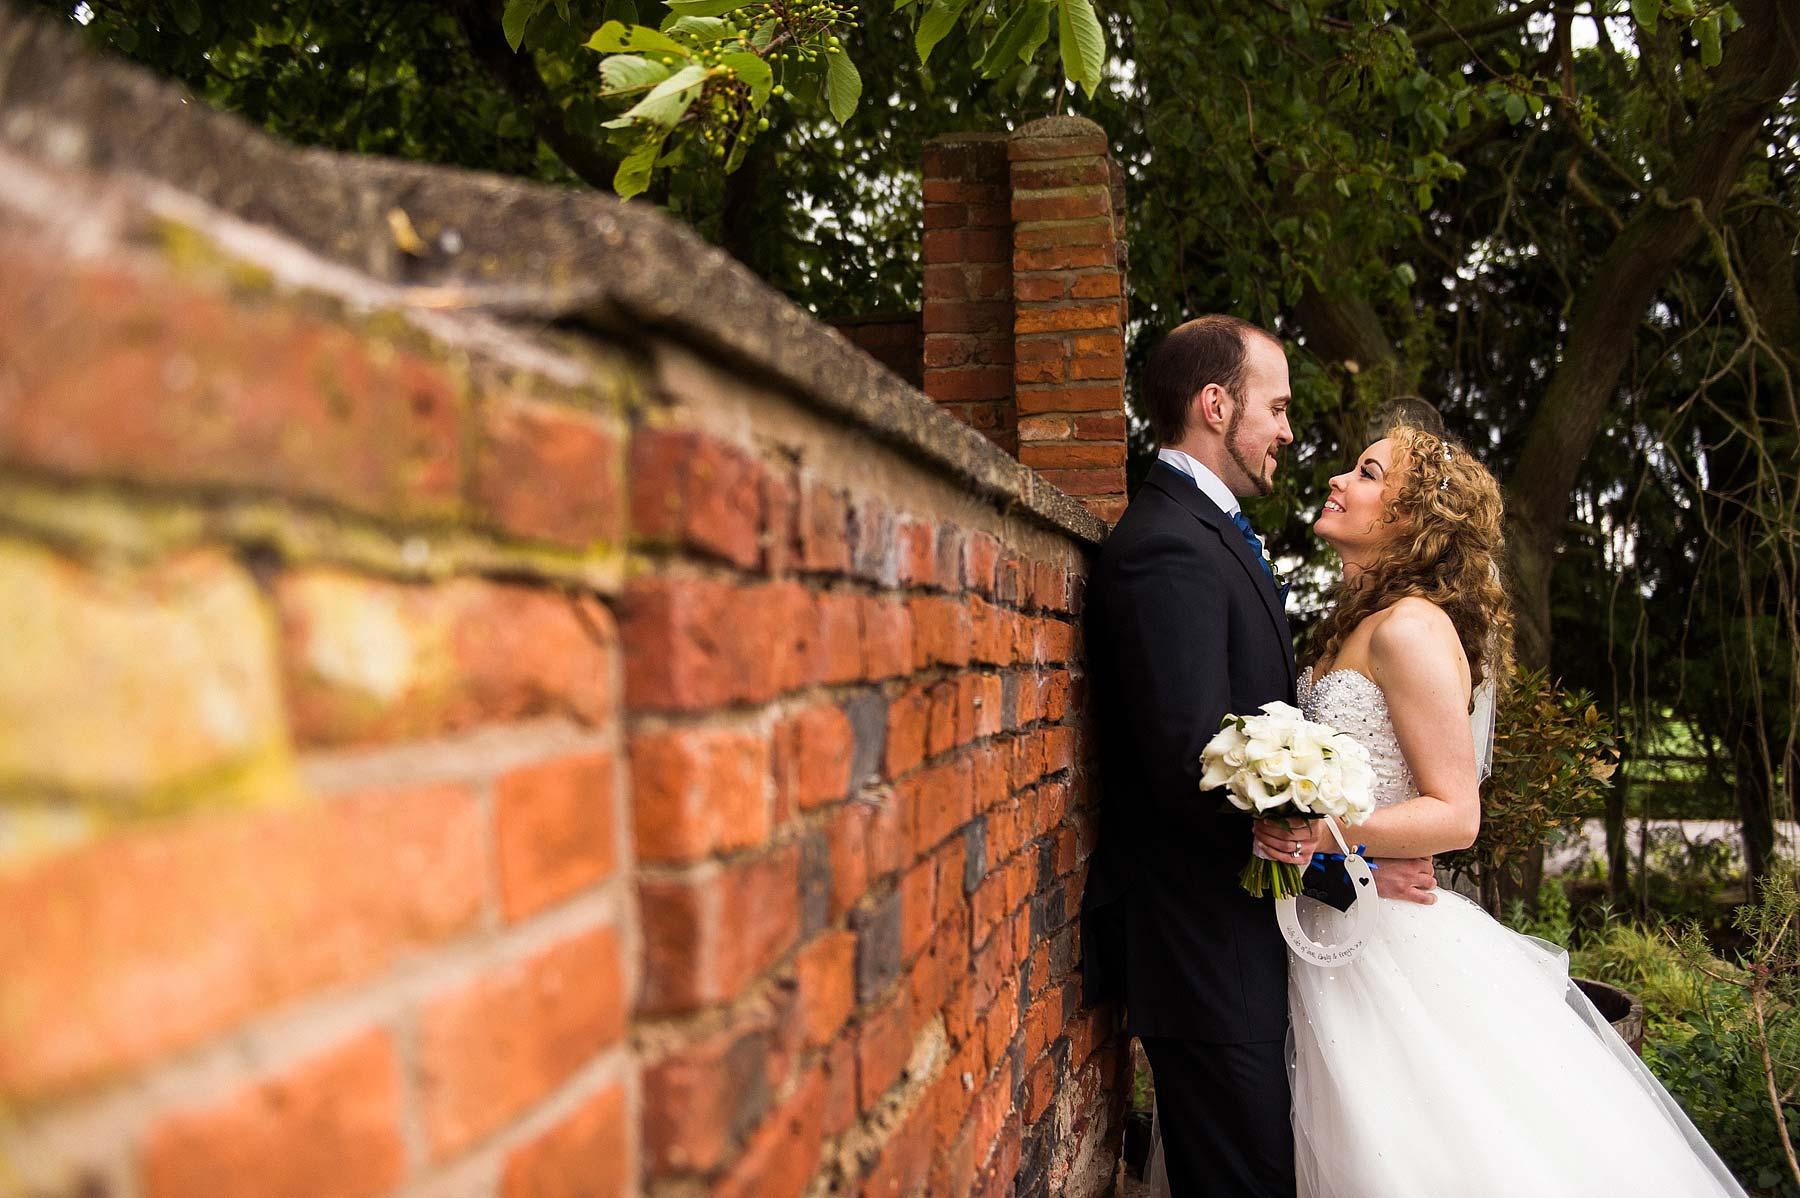 albright-hussey-manor-wedding-photographers-051